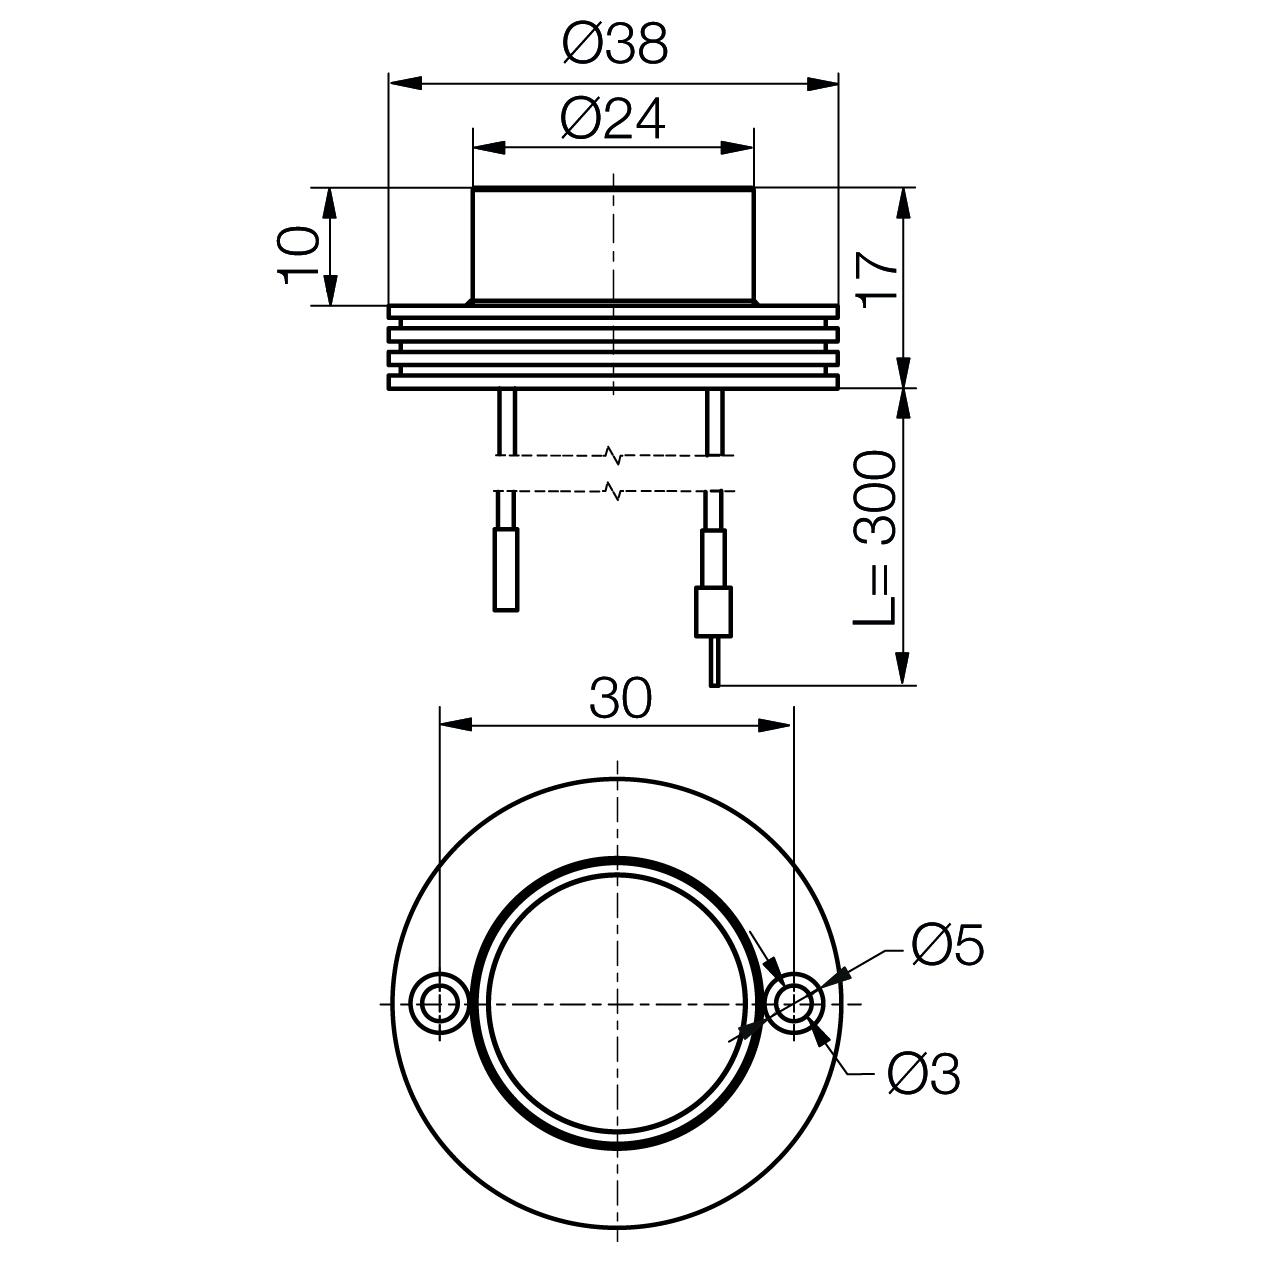 Power LED module MinoStar - plan